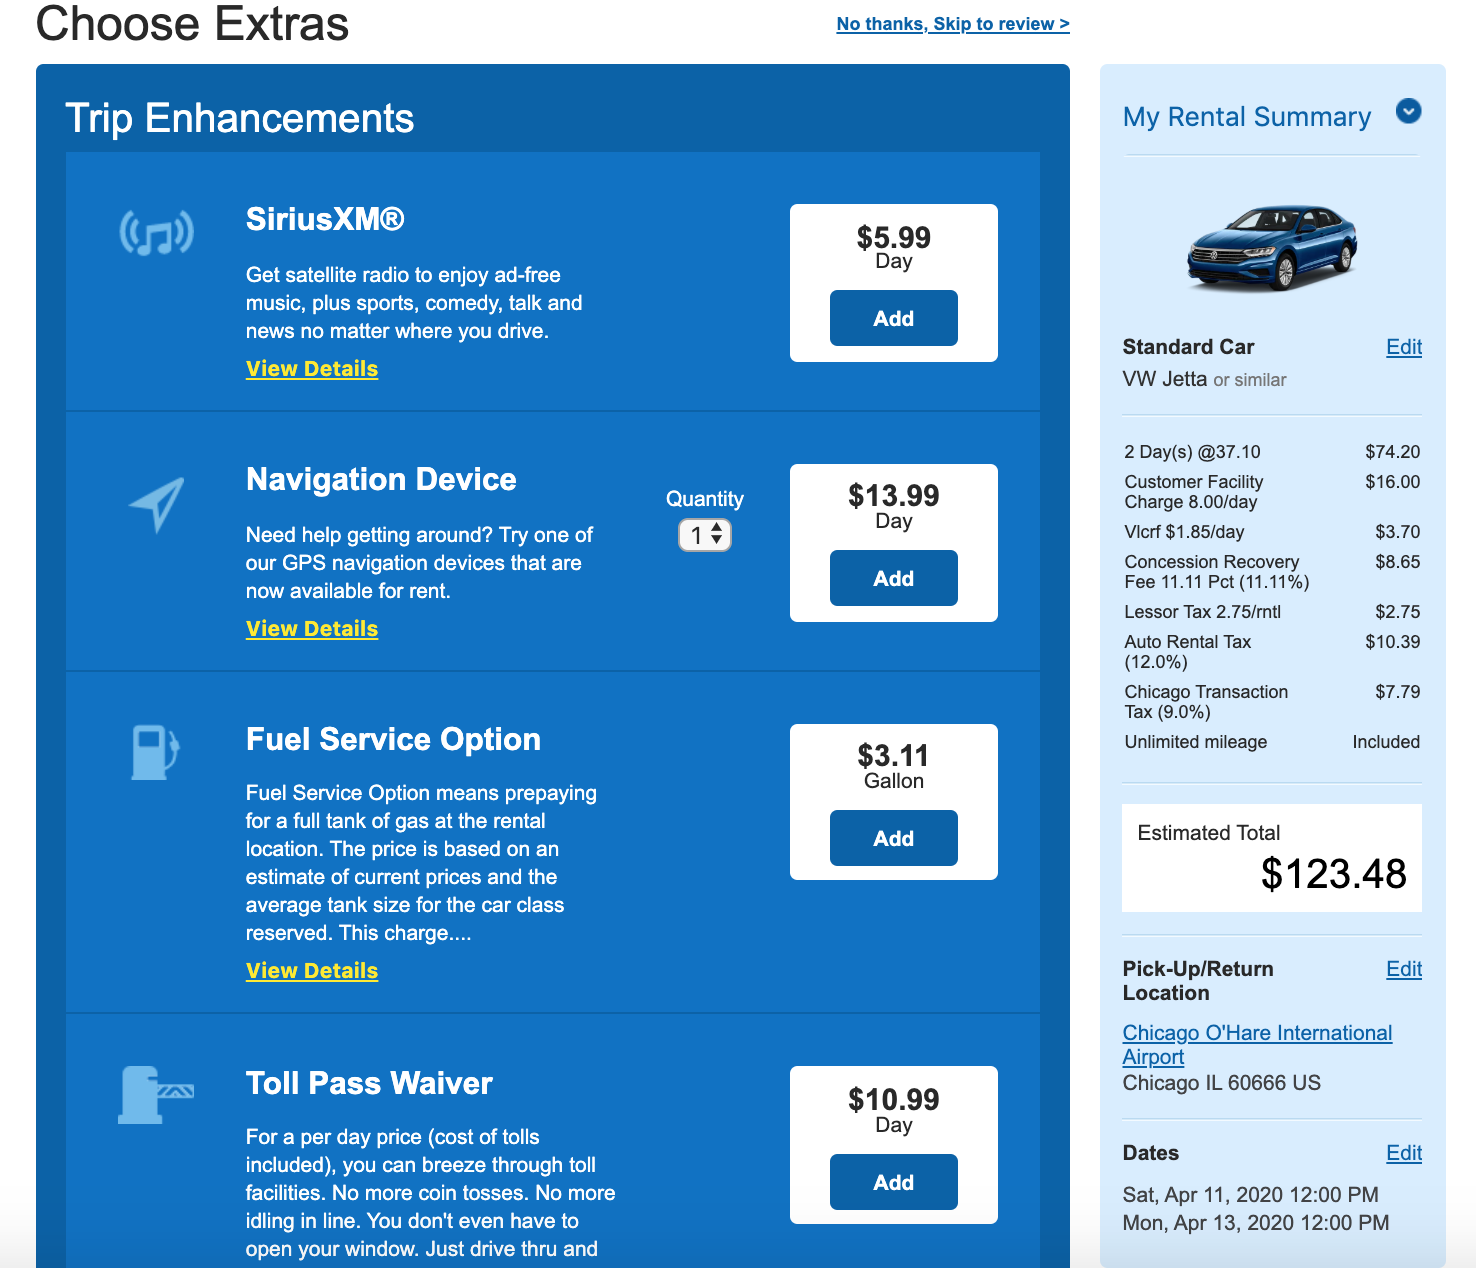 The Ultimate Guide To Alamo Rent A Car Alamo Insiders Loyalty Program